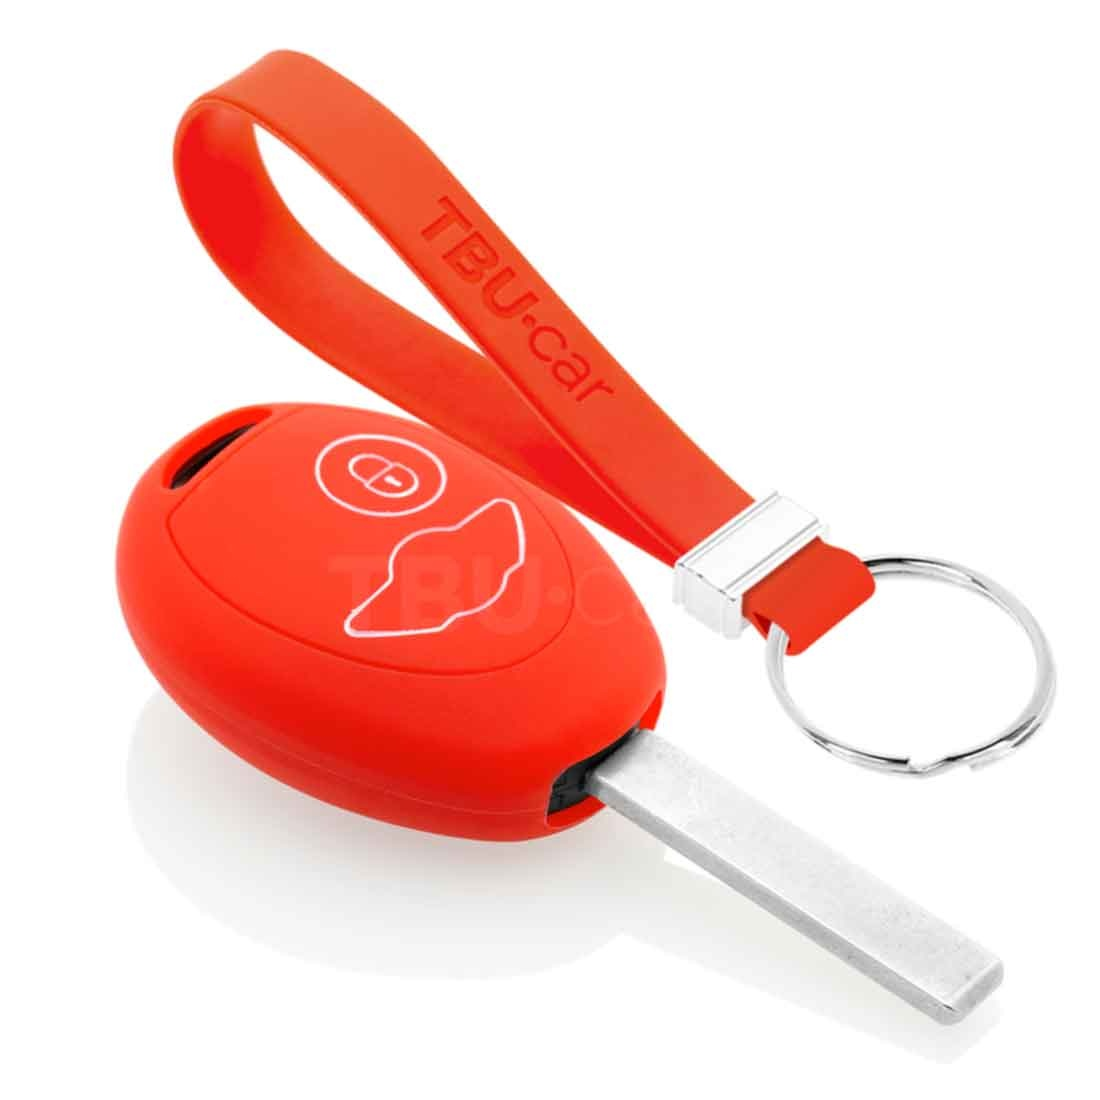 TBU car TBU car Sleutel cover compatibel met Mini - Silicone sleutelhoesje - beschermhoesje autosleutel - Rood